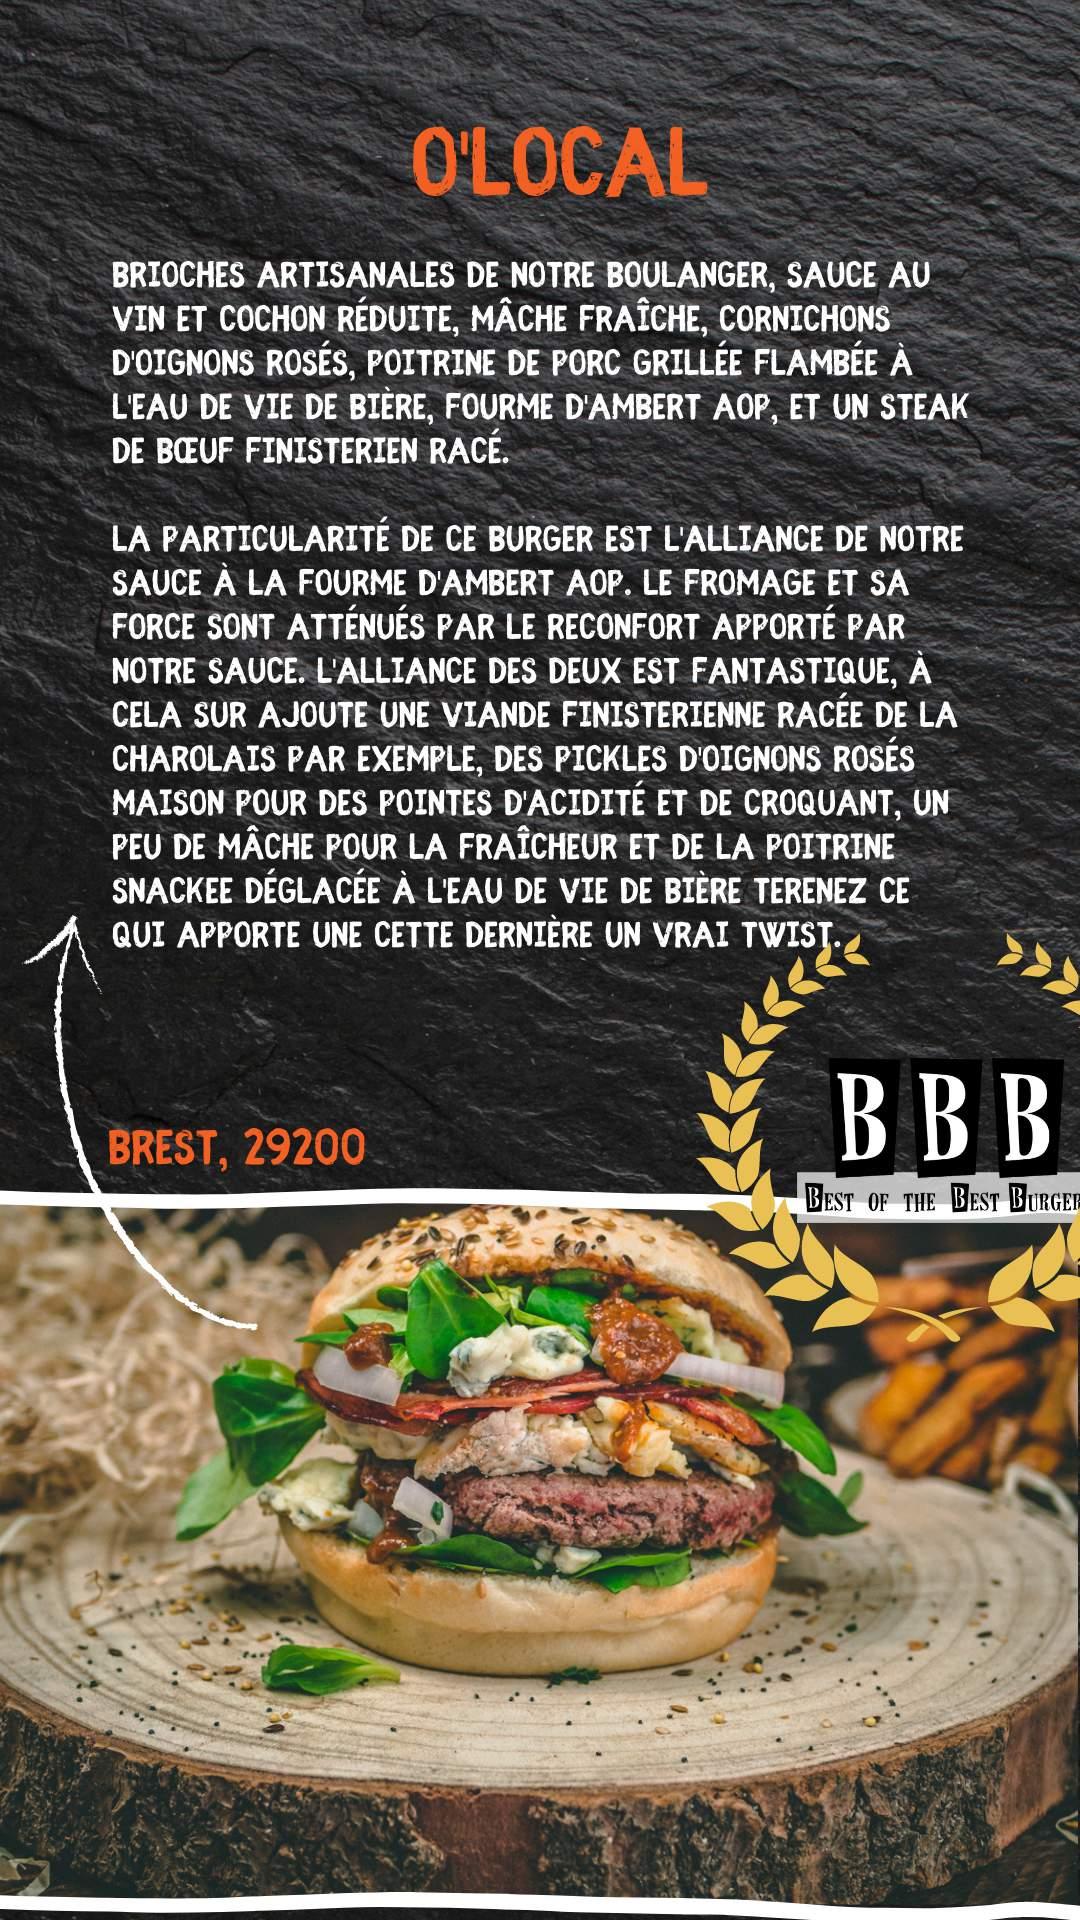 Burger du O'Local